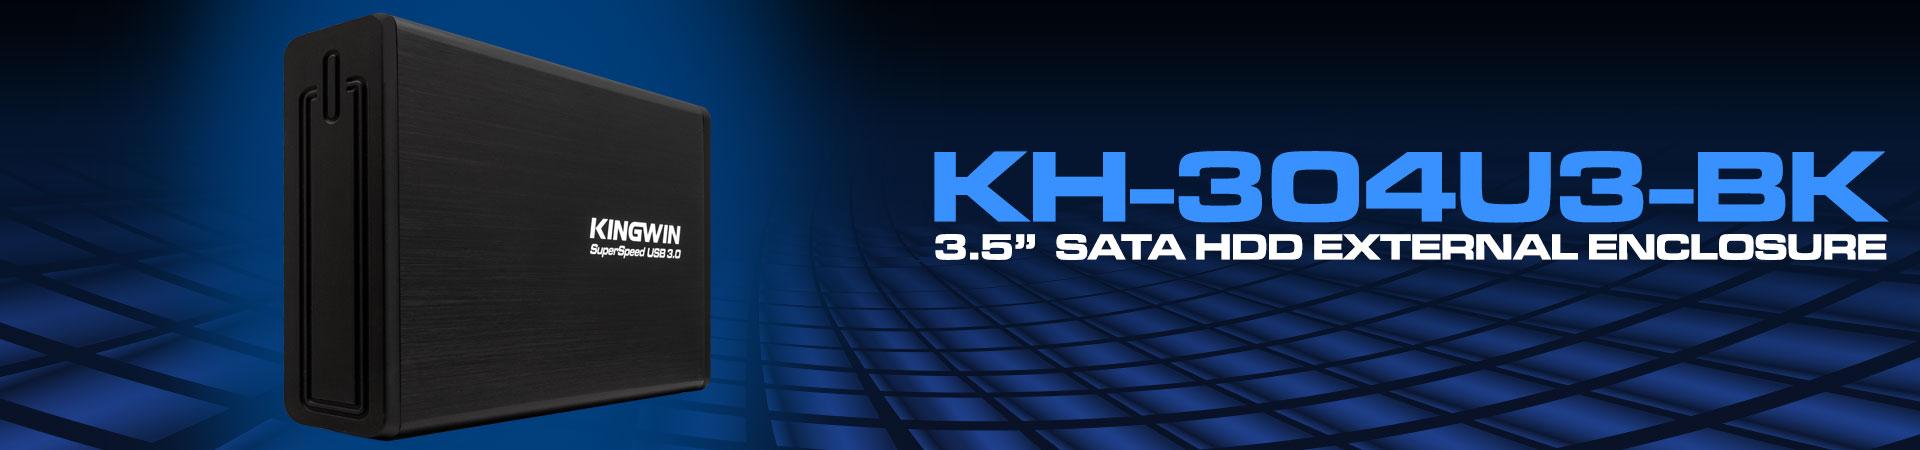 KH_304U3_BK_WEB-BANNER